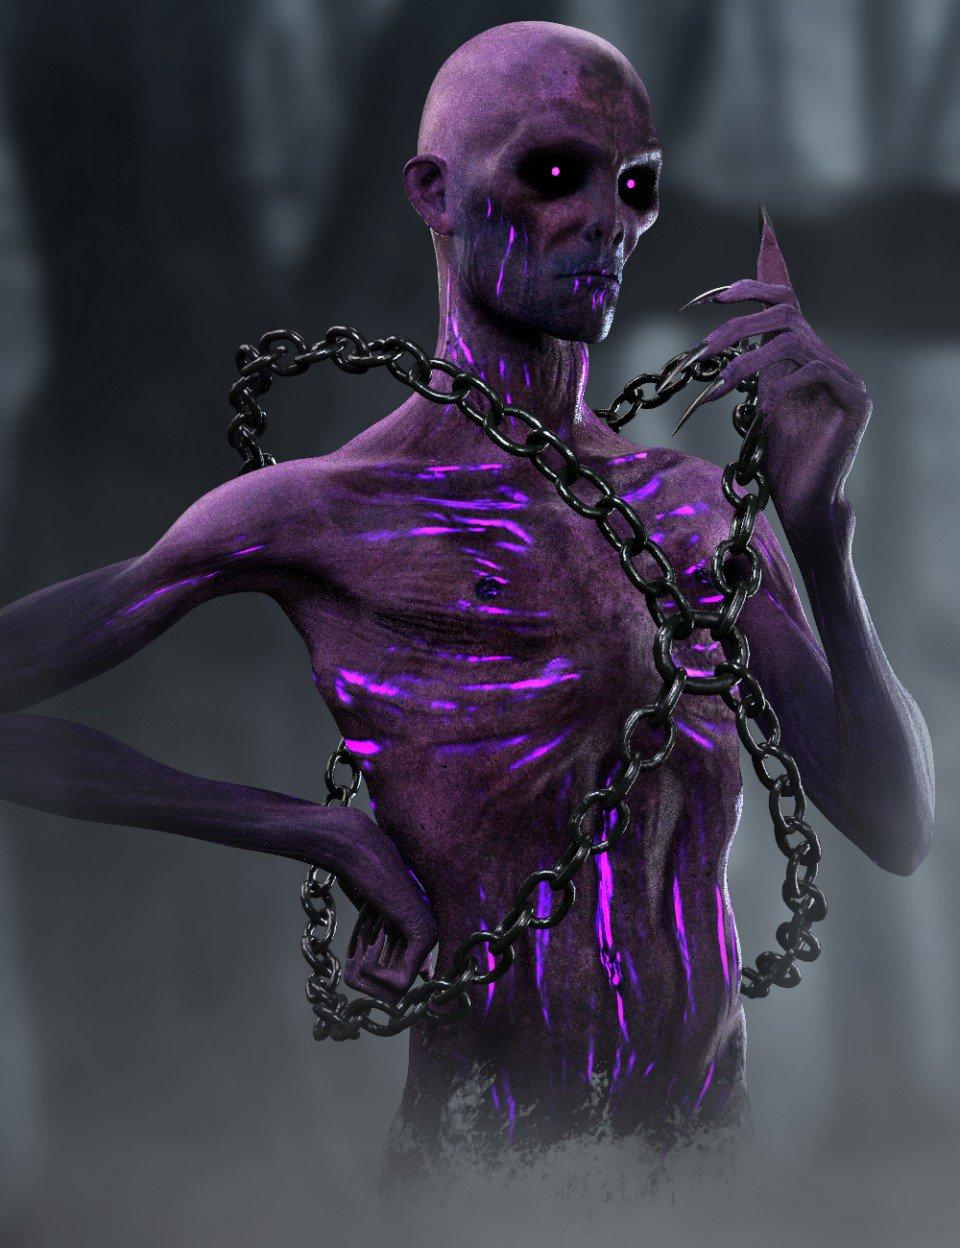 a-wraith-named-steve-hd-for-genesis-8-male